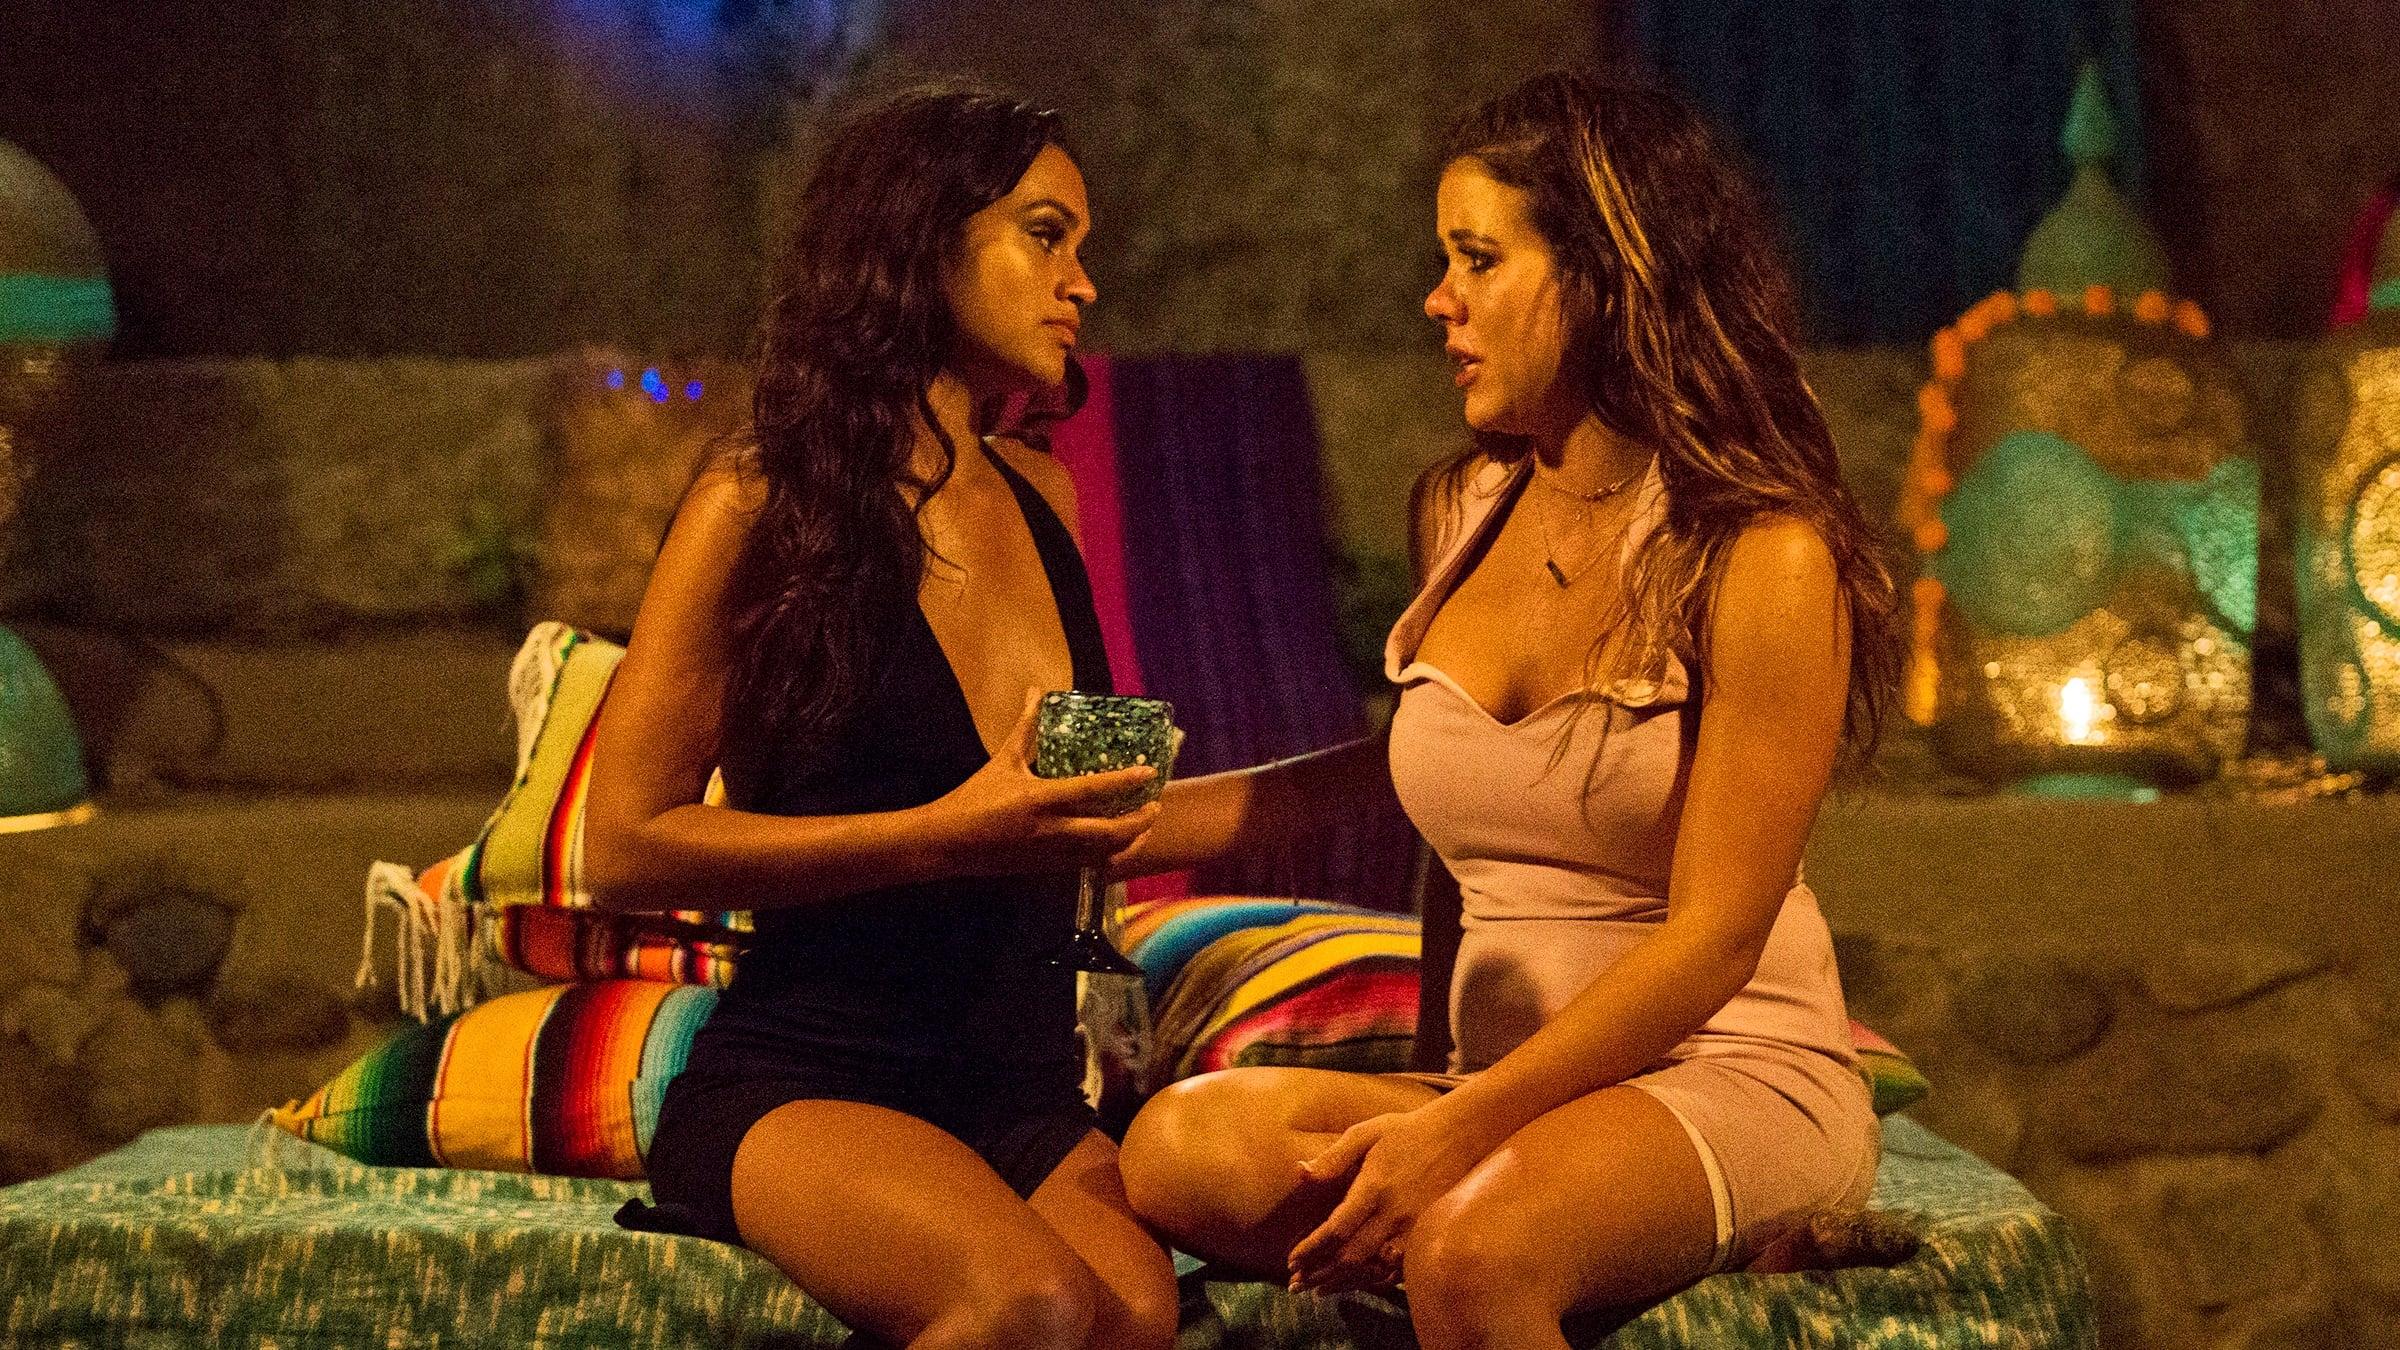 Bachelor in Paradise - Season 4 Episode 5 : Week 3, Part 1